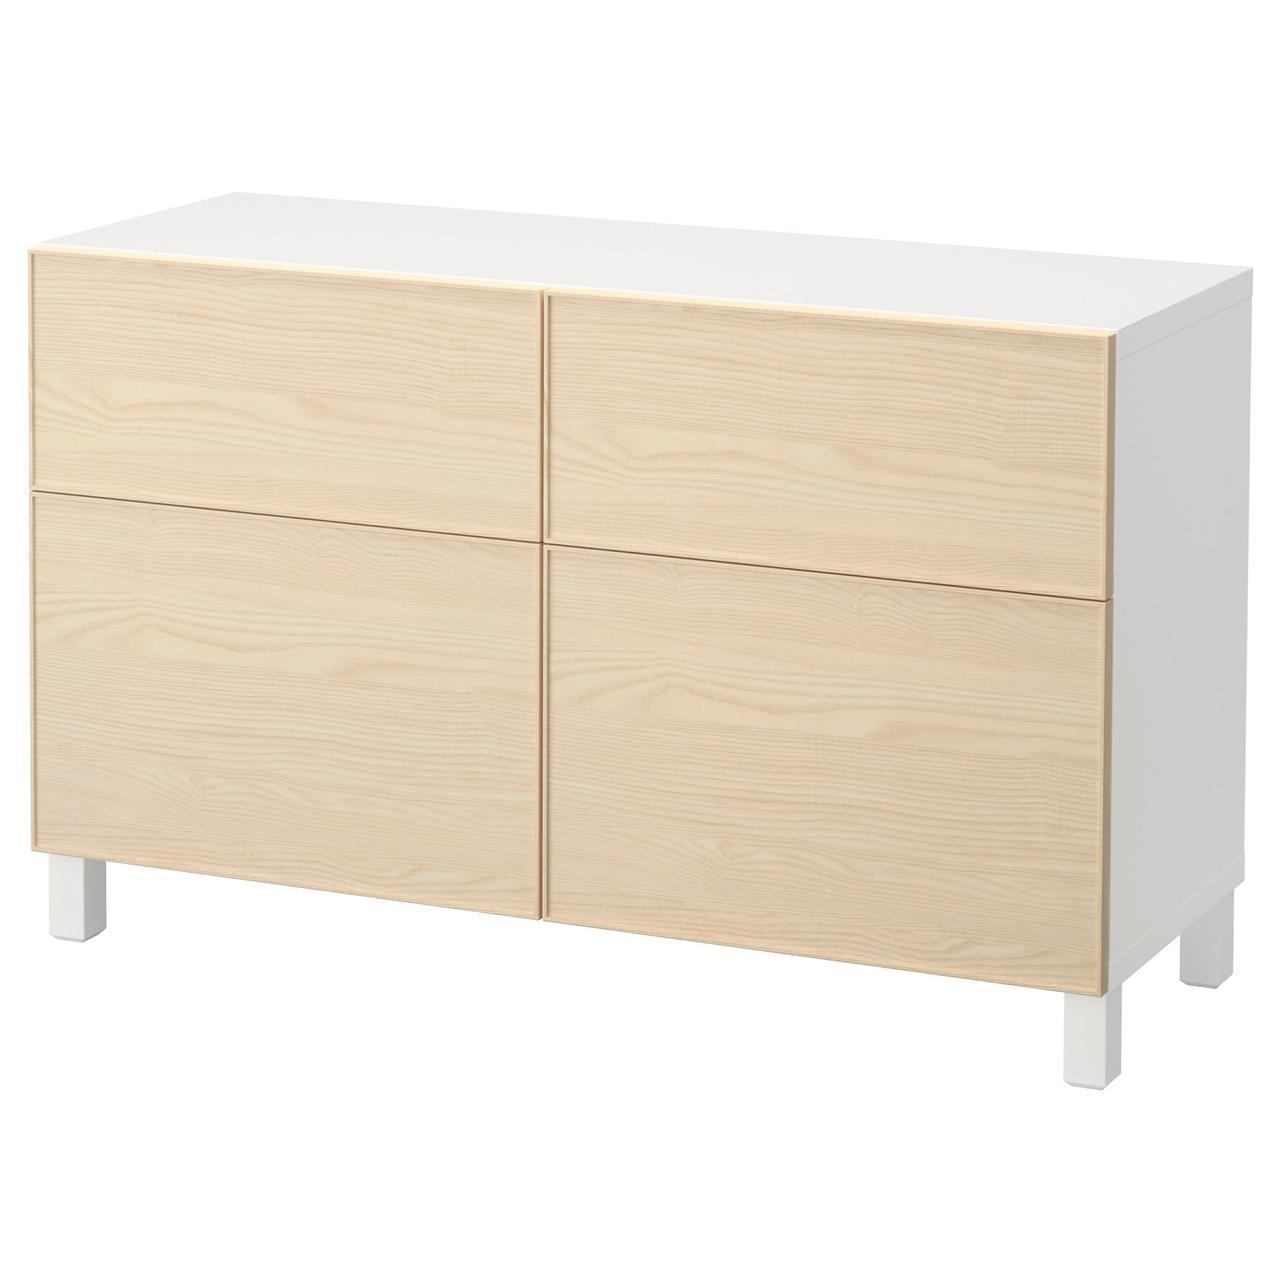 Тумба IKEA BESTÅ 120x40x74 см Inviken ясеневый шпон белая 892.061.06